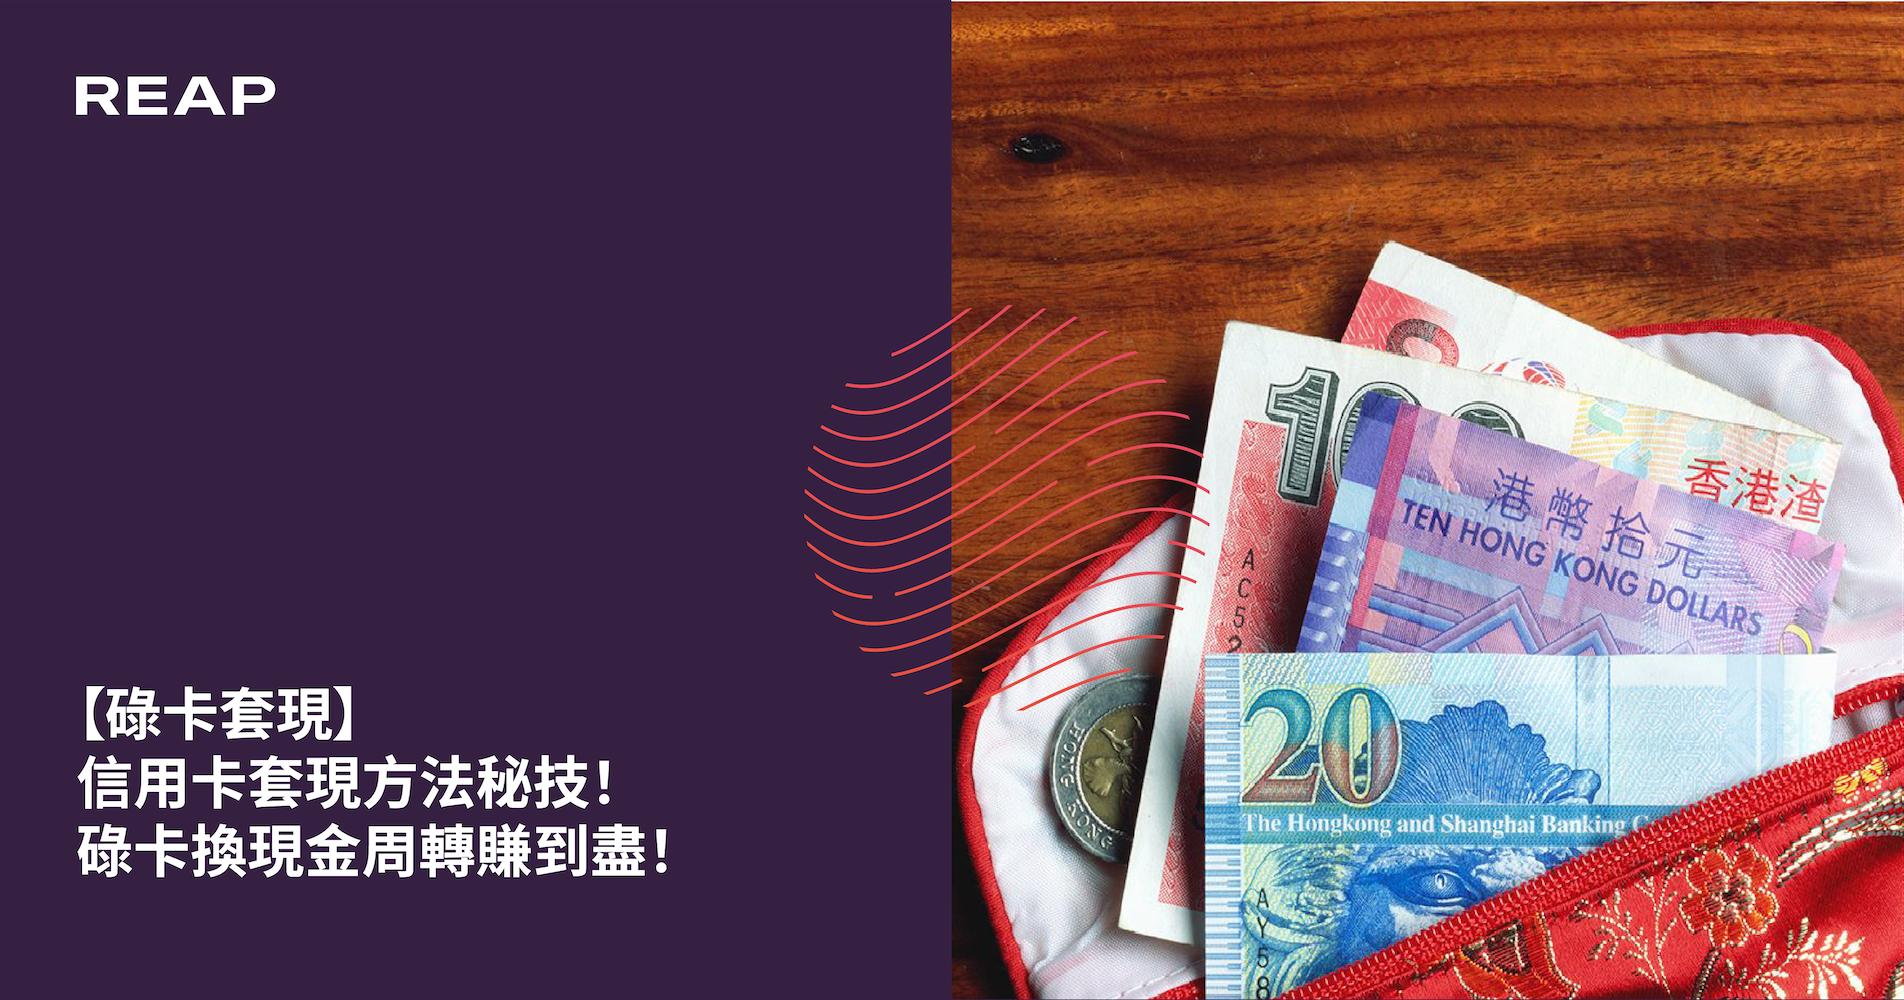 Cover Image for 【碌卡套現】信用卡套現方法秘技!碌卡換現金周轉賺到盡!